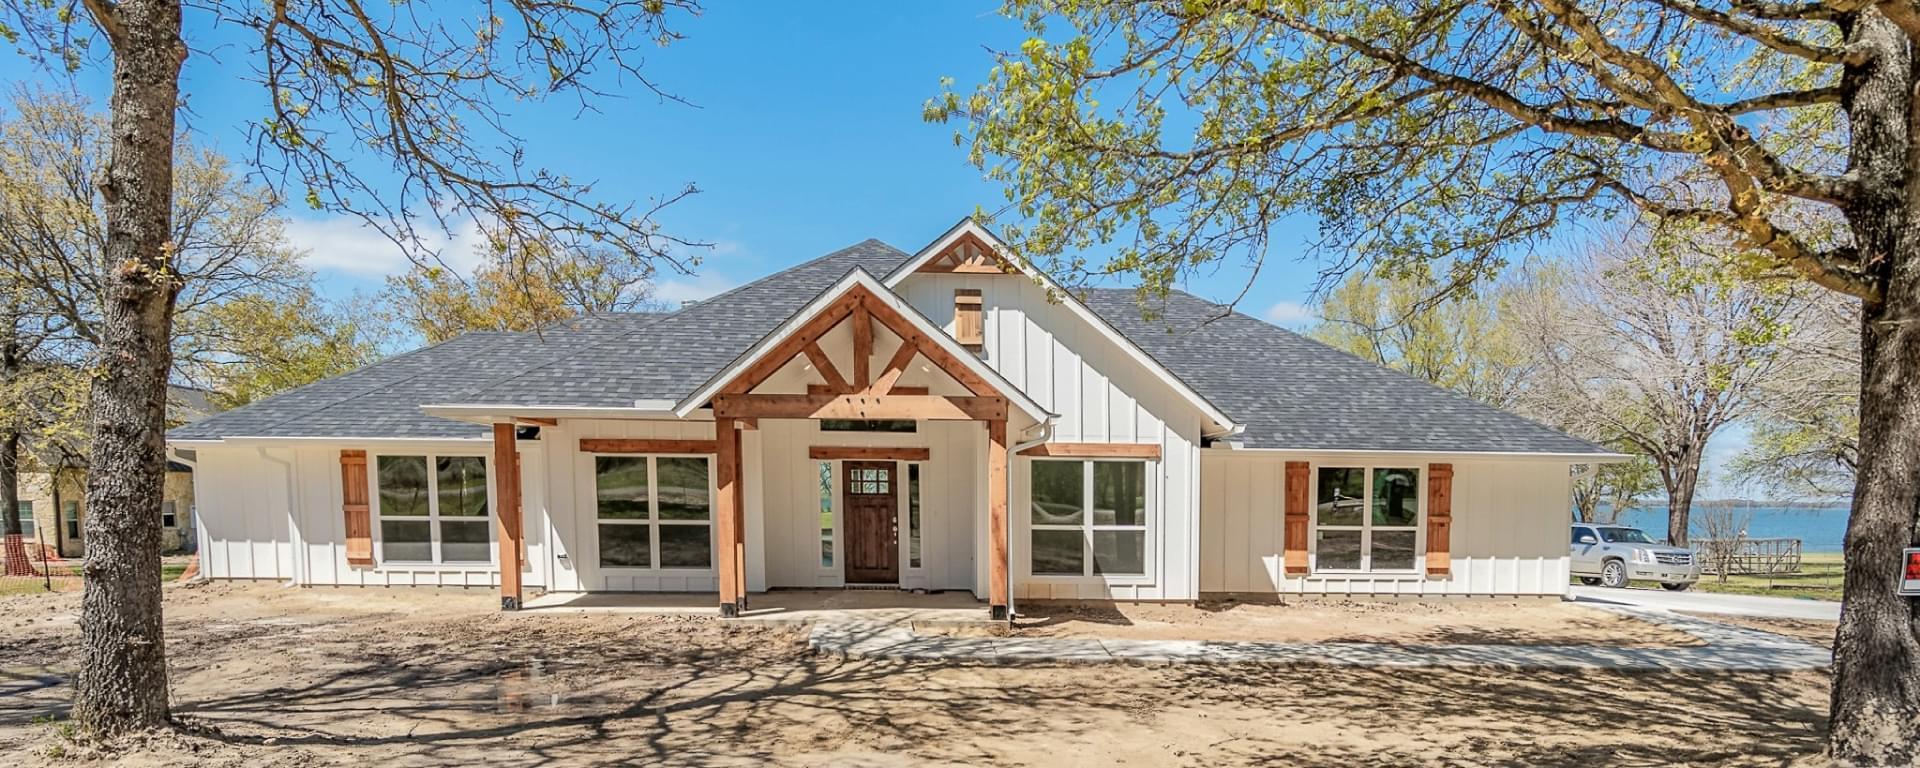 A True Custom Home in Navarro County